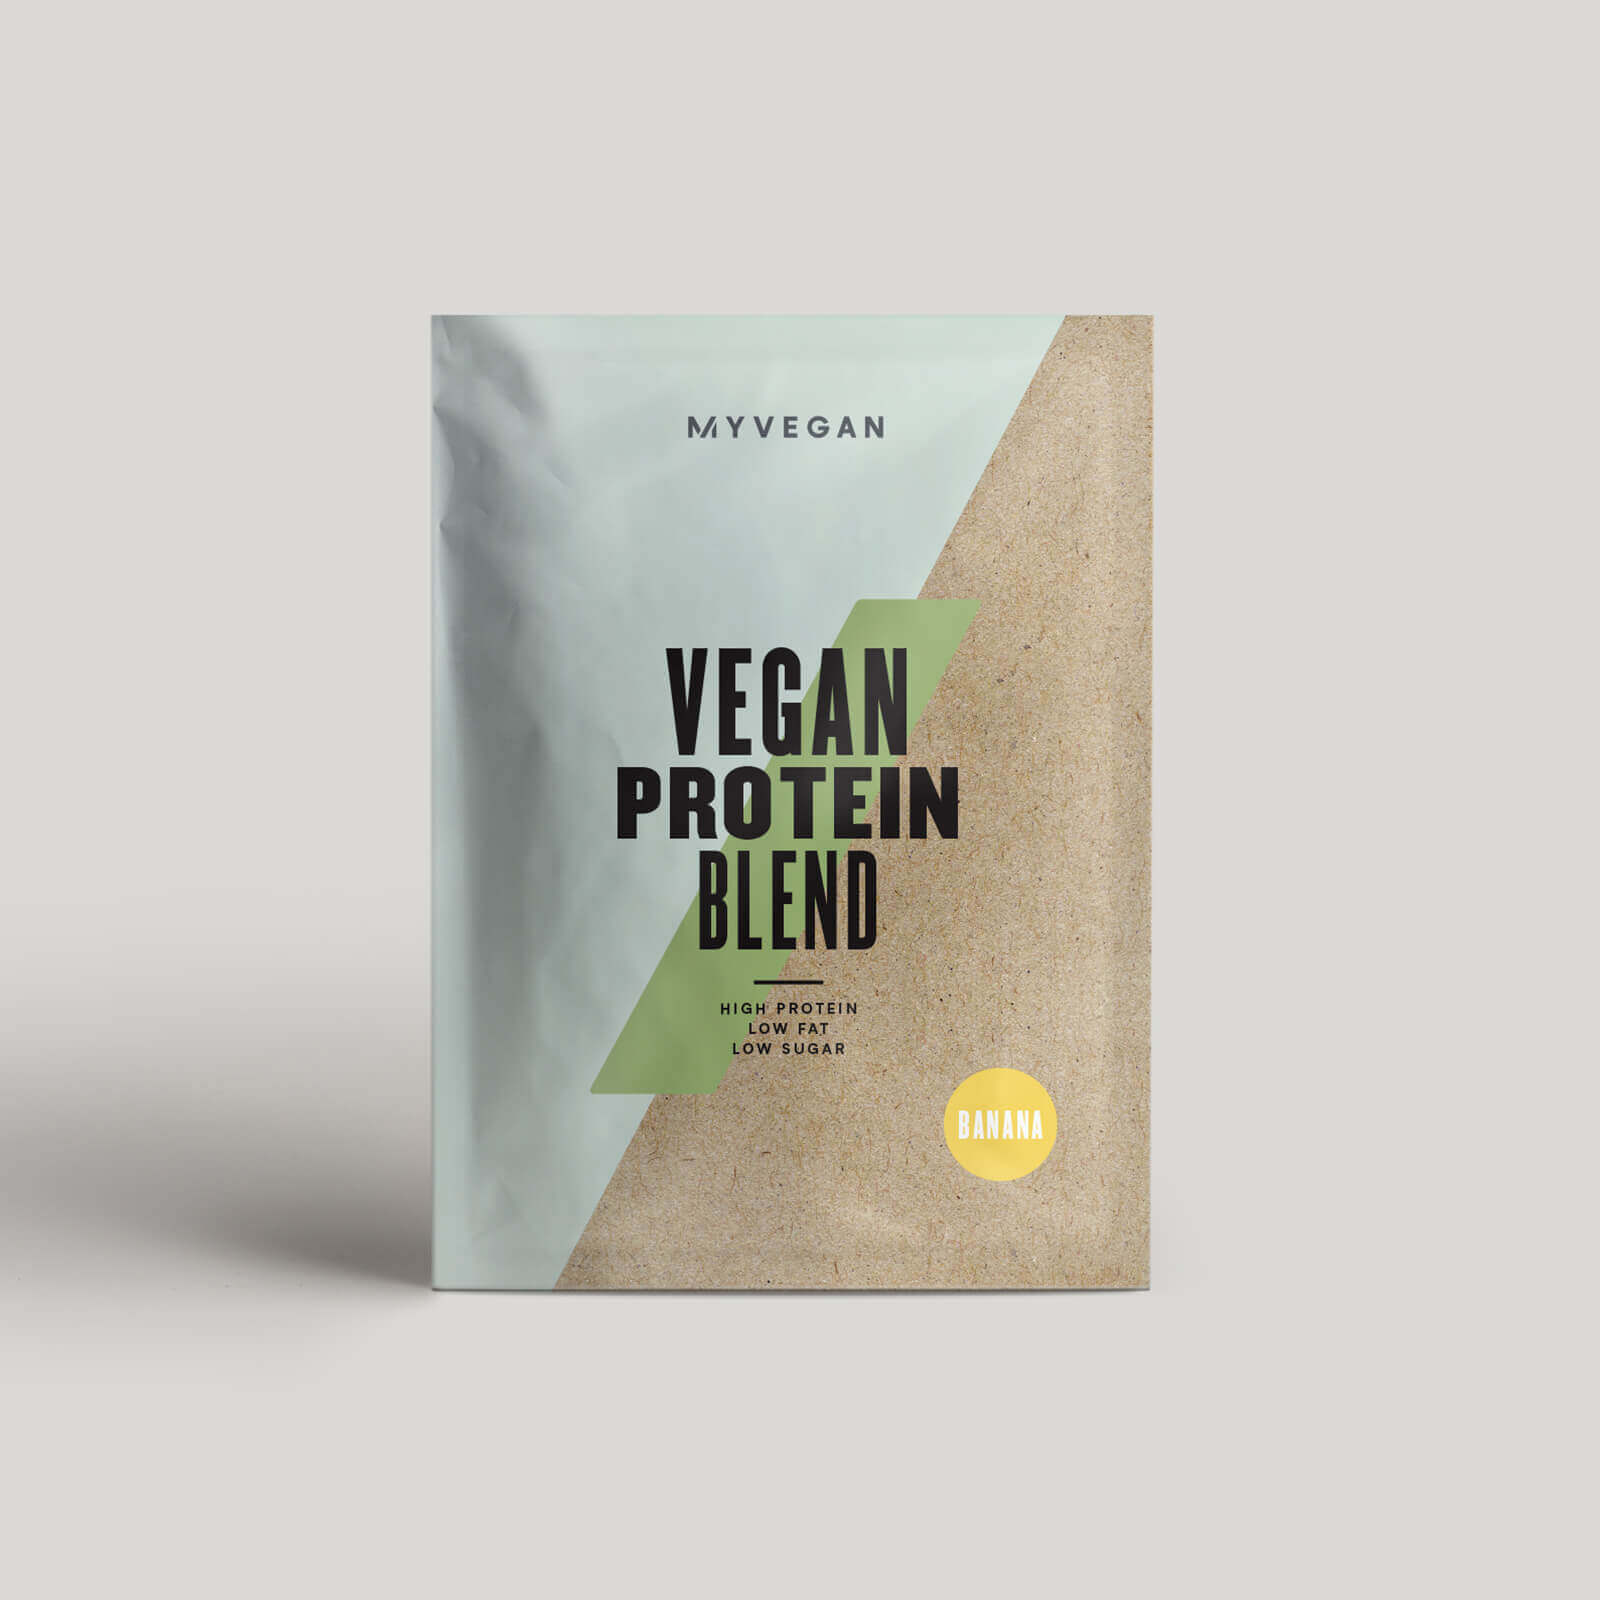 Myvegan Vegan Protein Blend (Sample) - 30g - Banane